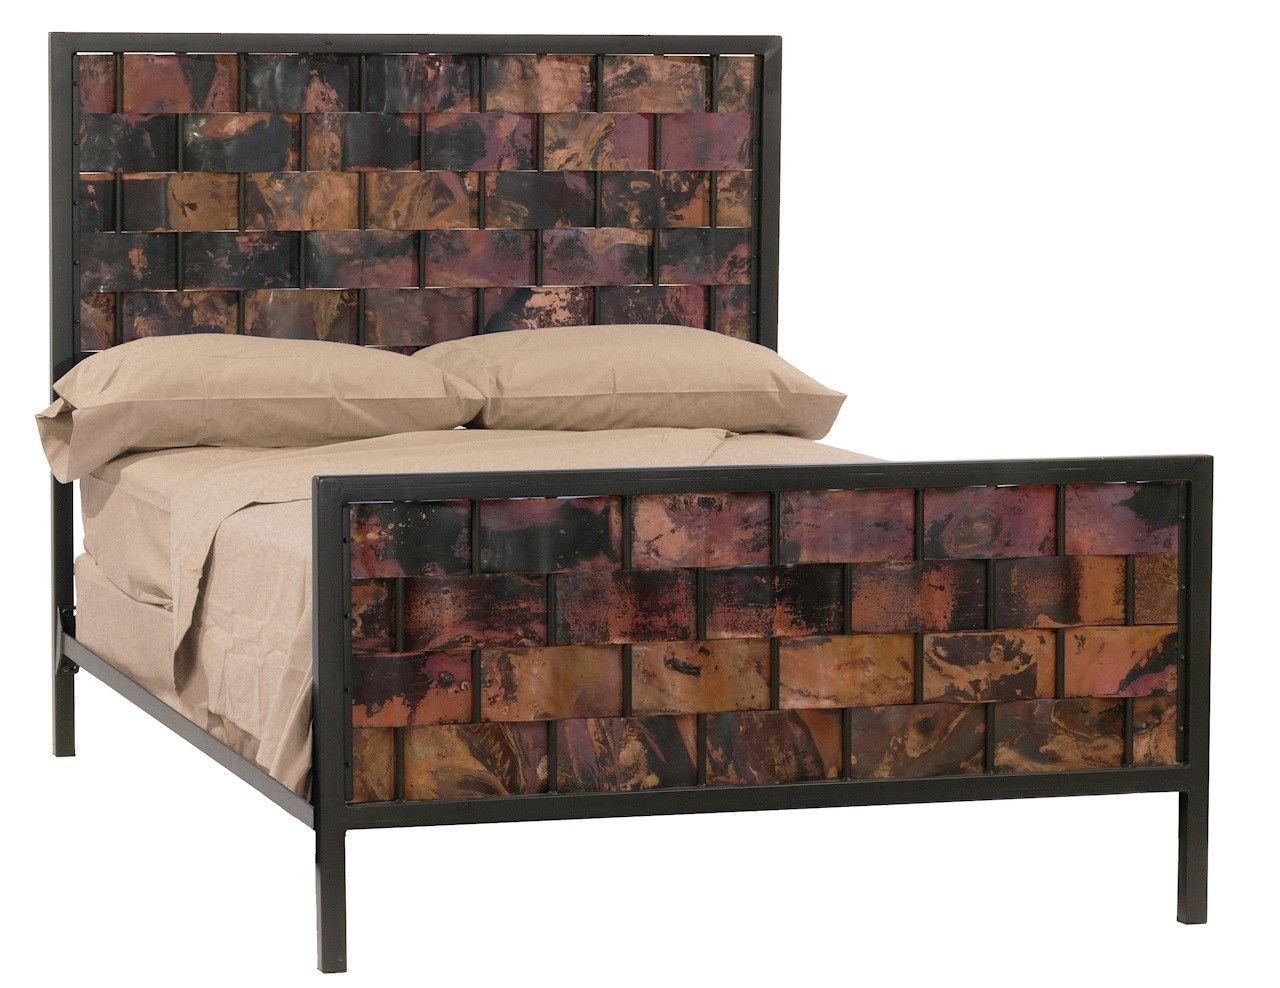 steam punk furniture. Steampunk+furniture   Steampunk Furniture Steam Punk